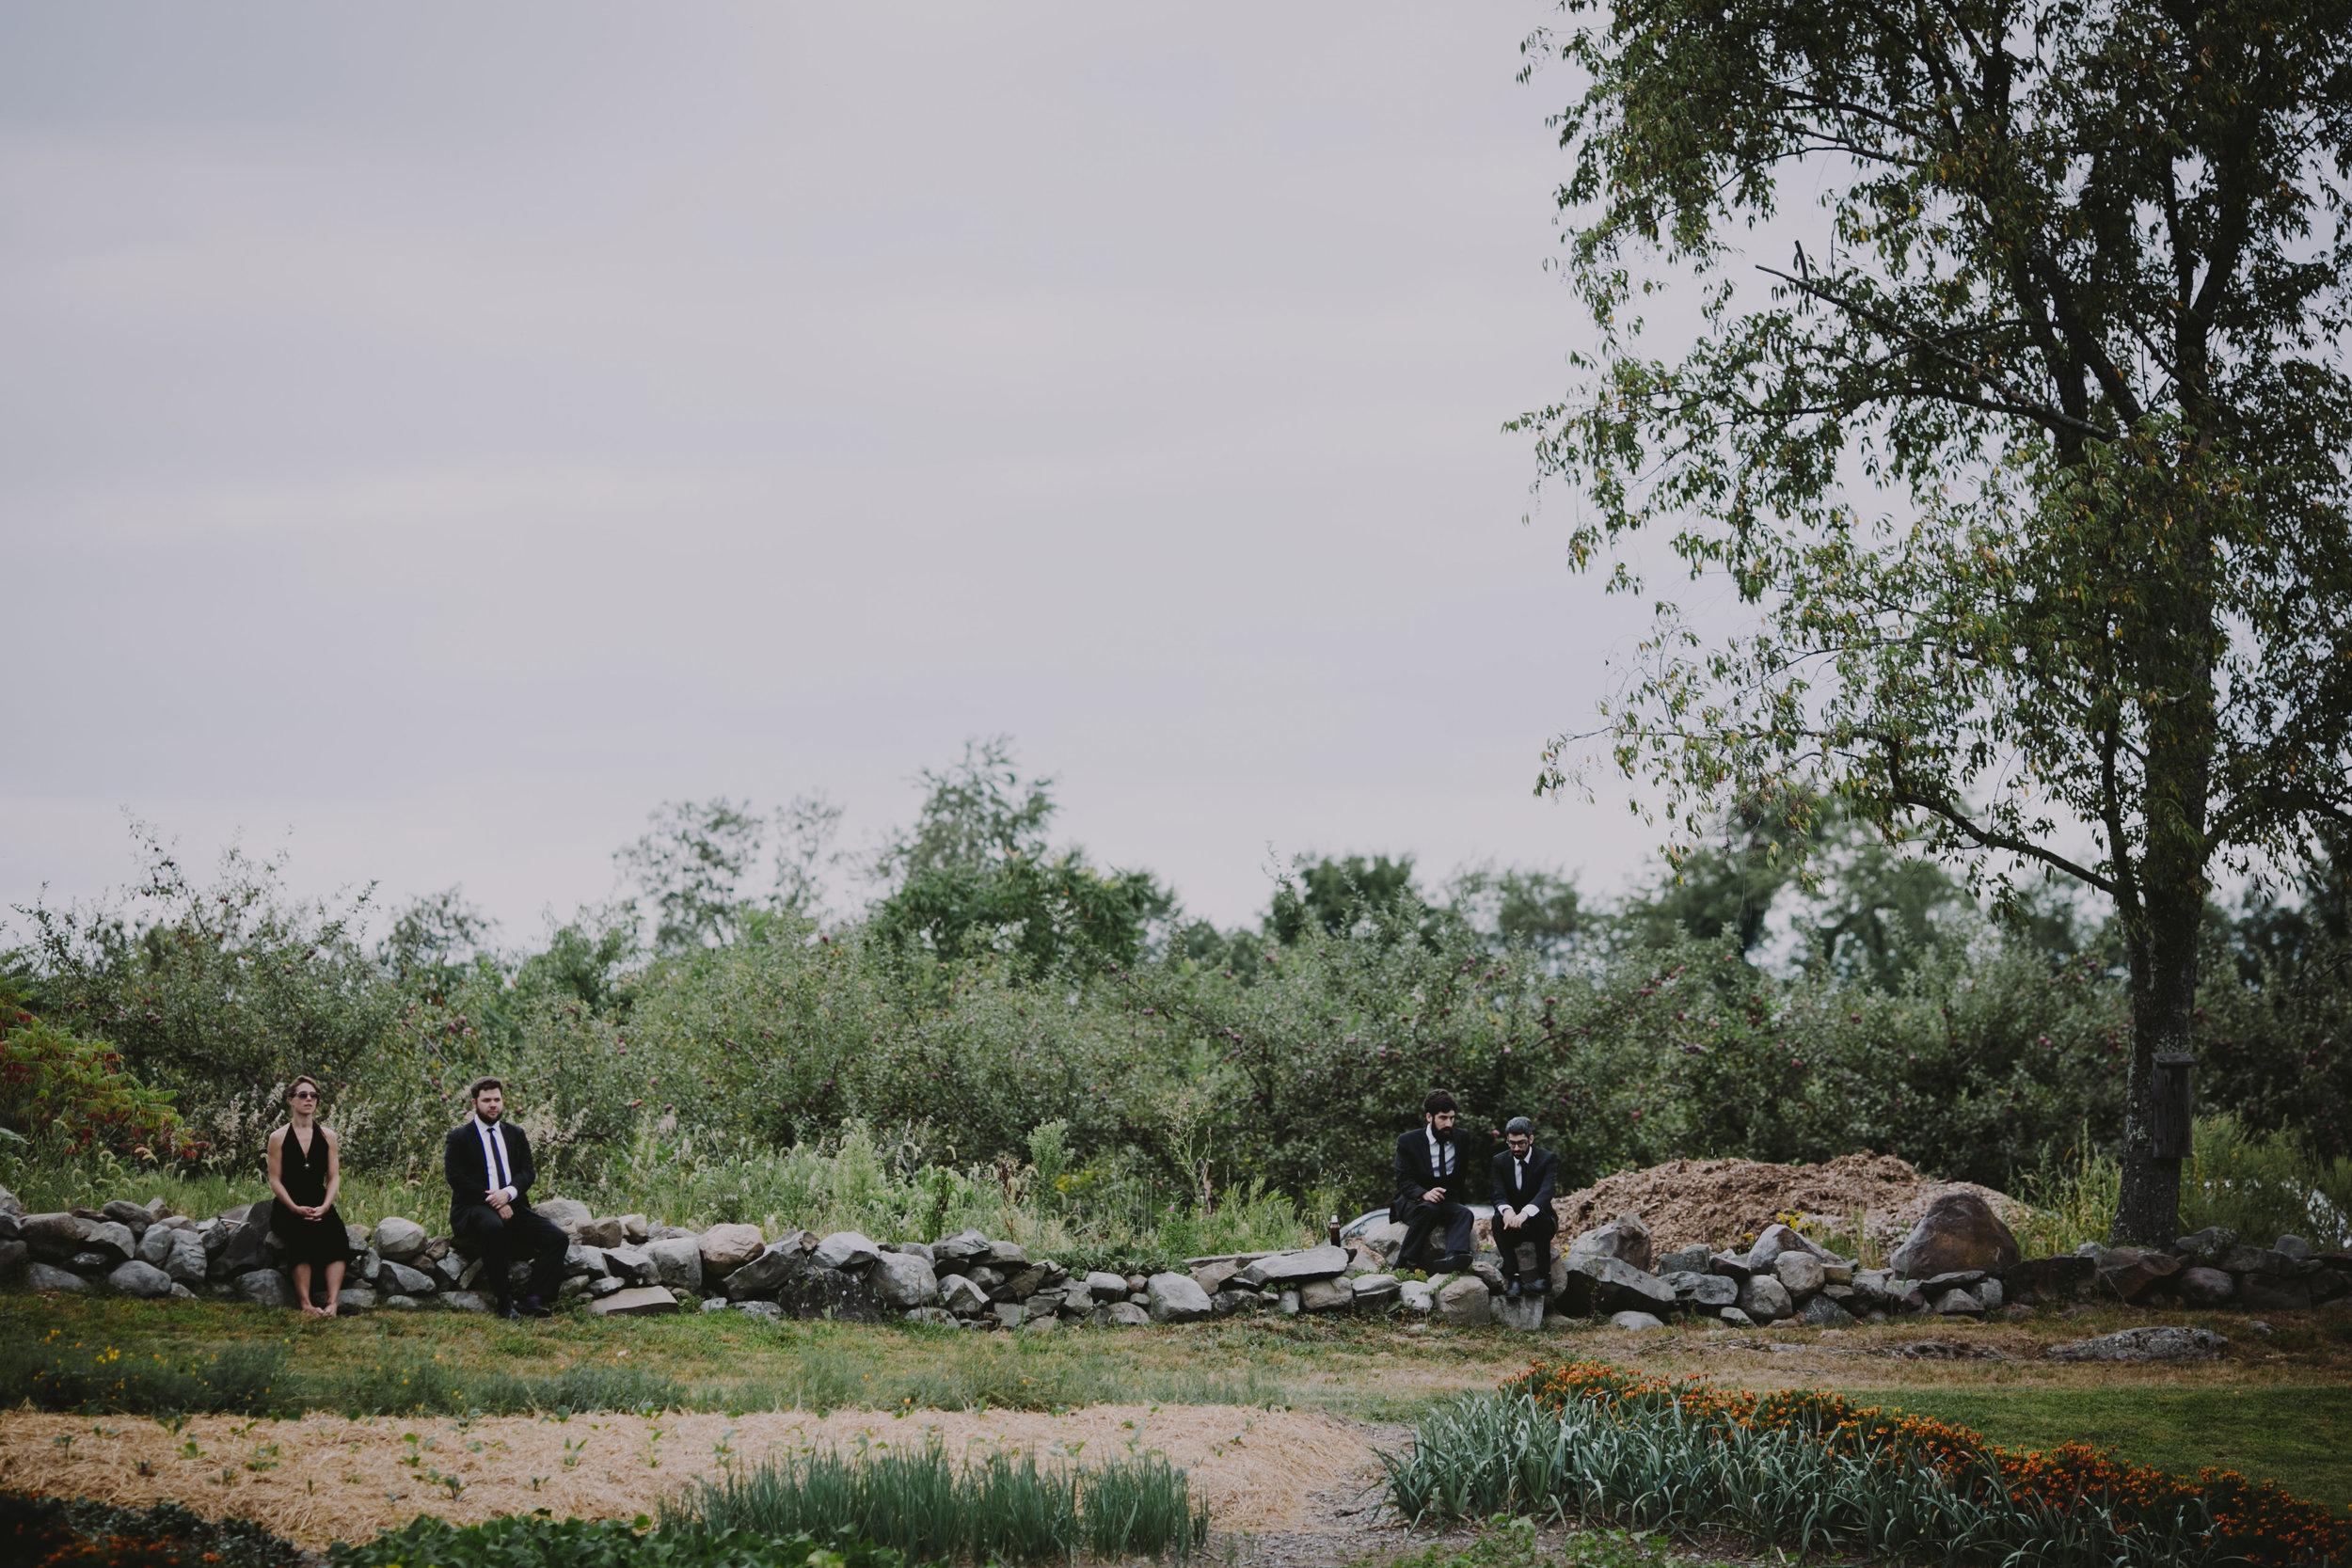 LIBERTY_VIEW_FARM_HIGHLAND_NY_WEDDING_CHELLISE_MICHAEL_PHOTOGRAPHY835.JPG